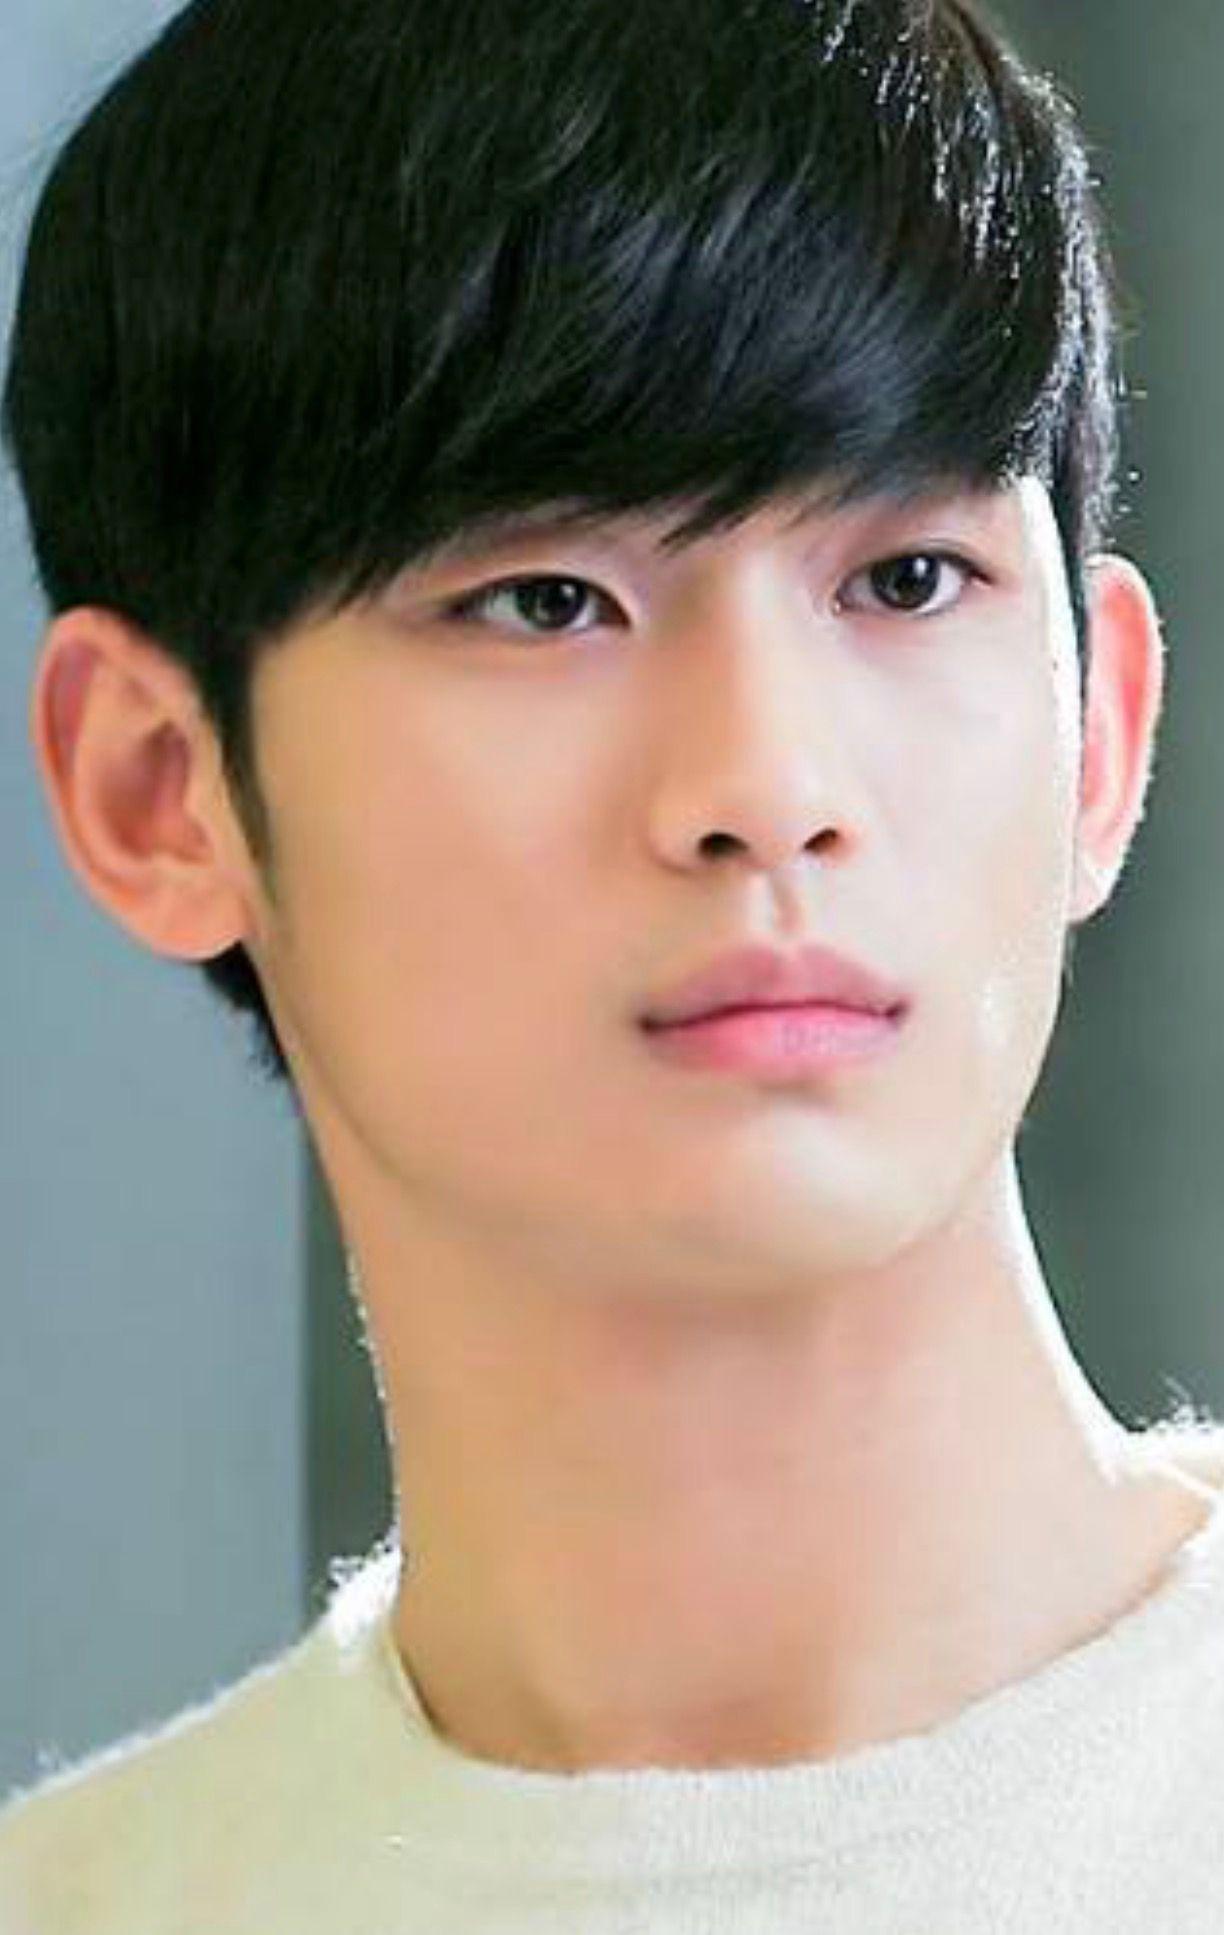 People In China Are Thirsty To Get The Kim Soo Hyun Phone Kim Soo Hyun Kim Handsome Korean Actors